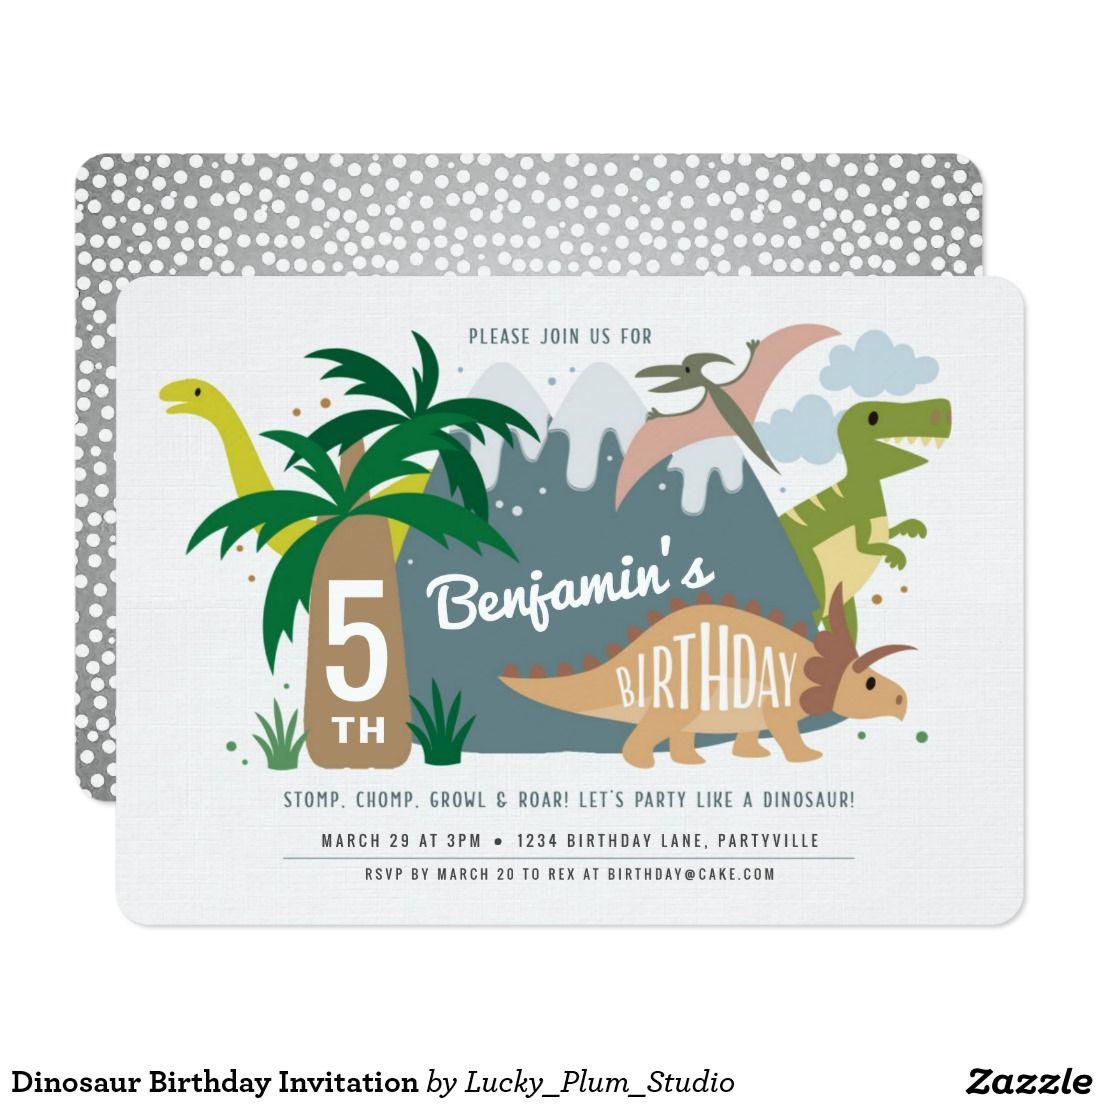 Dinosaur Birthday Invitation | Party Invitations | Pinterest ...